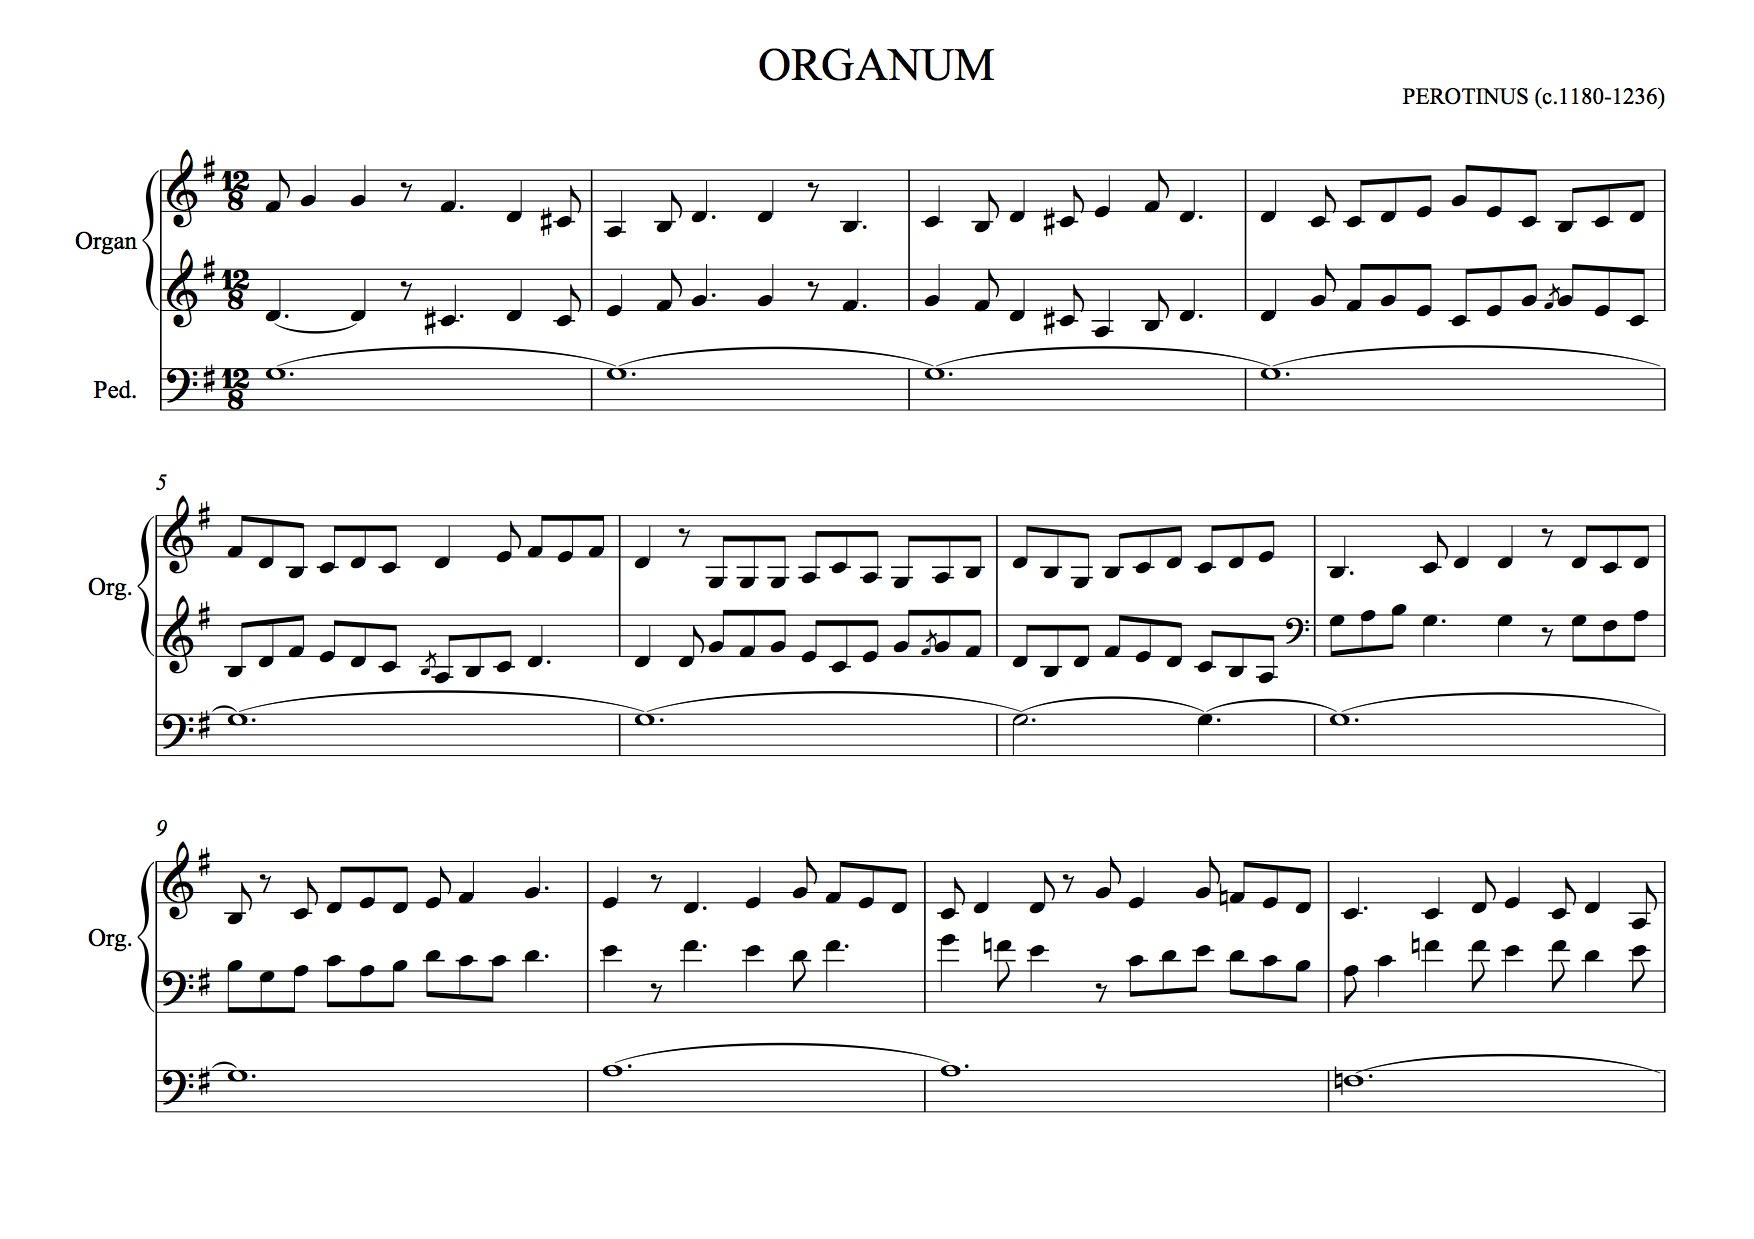 Perotin -Organum Triplum | MUSC520 Musical Styles S14 Wiki